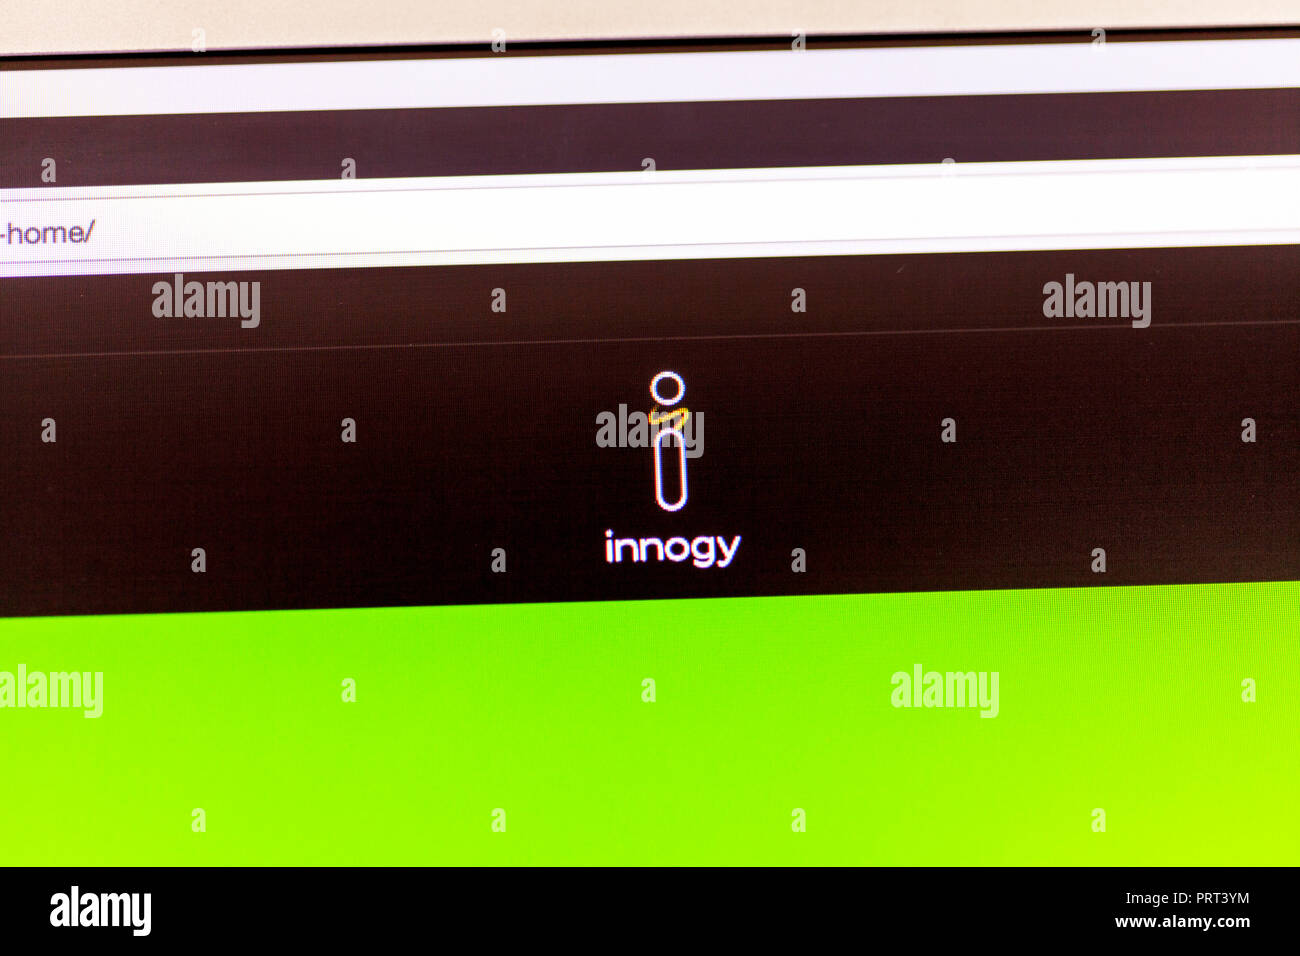 Innogy SE energy company, Innogy website, Innogy UK, Innogy logo, Innogy homepage, Innogy, logo, website, energy company UK, energy company's UK, Stock Photo